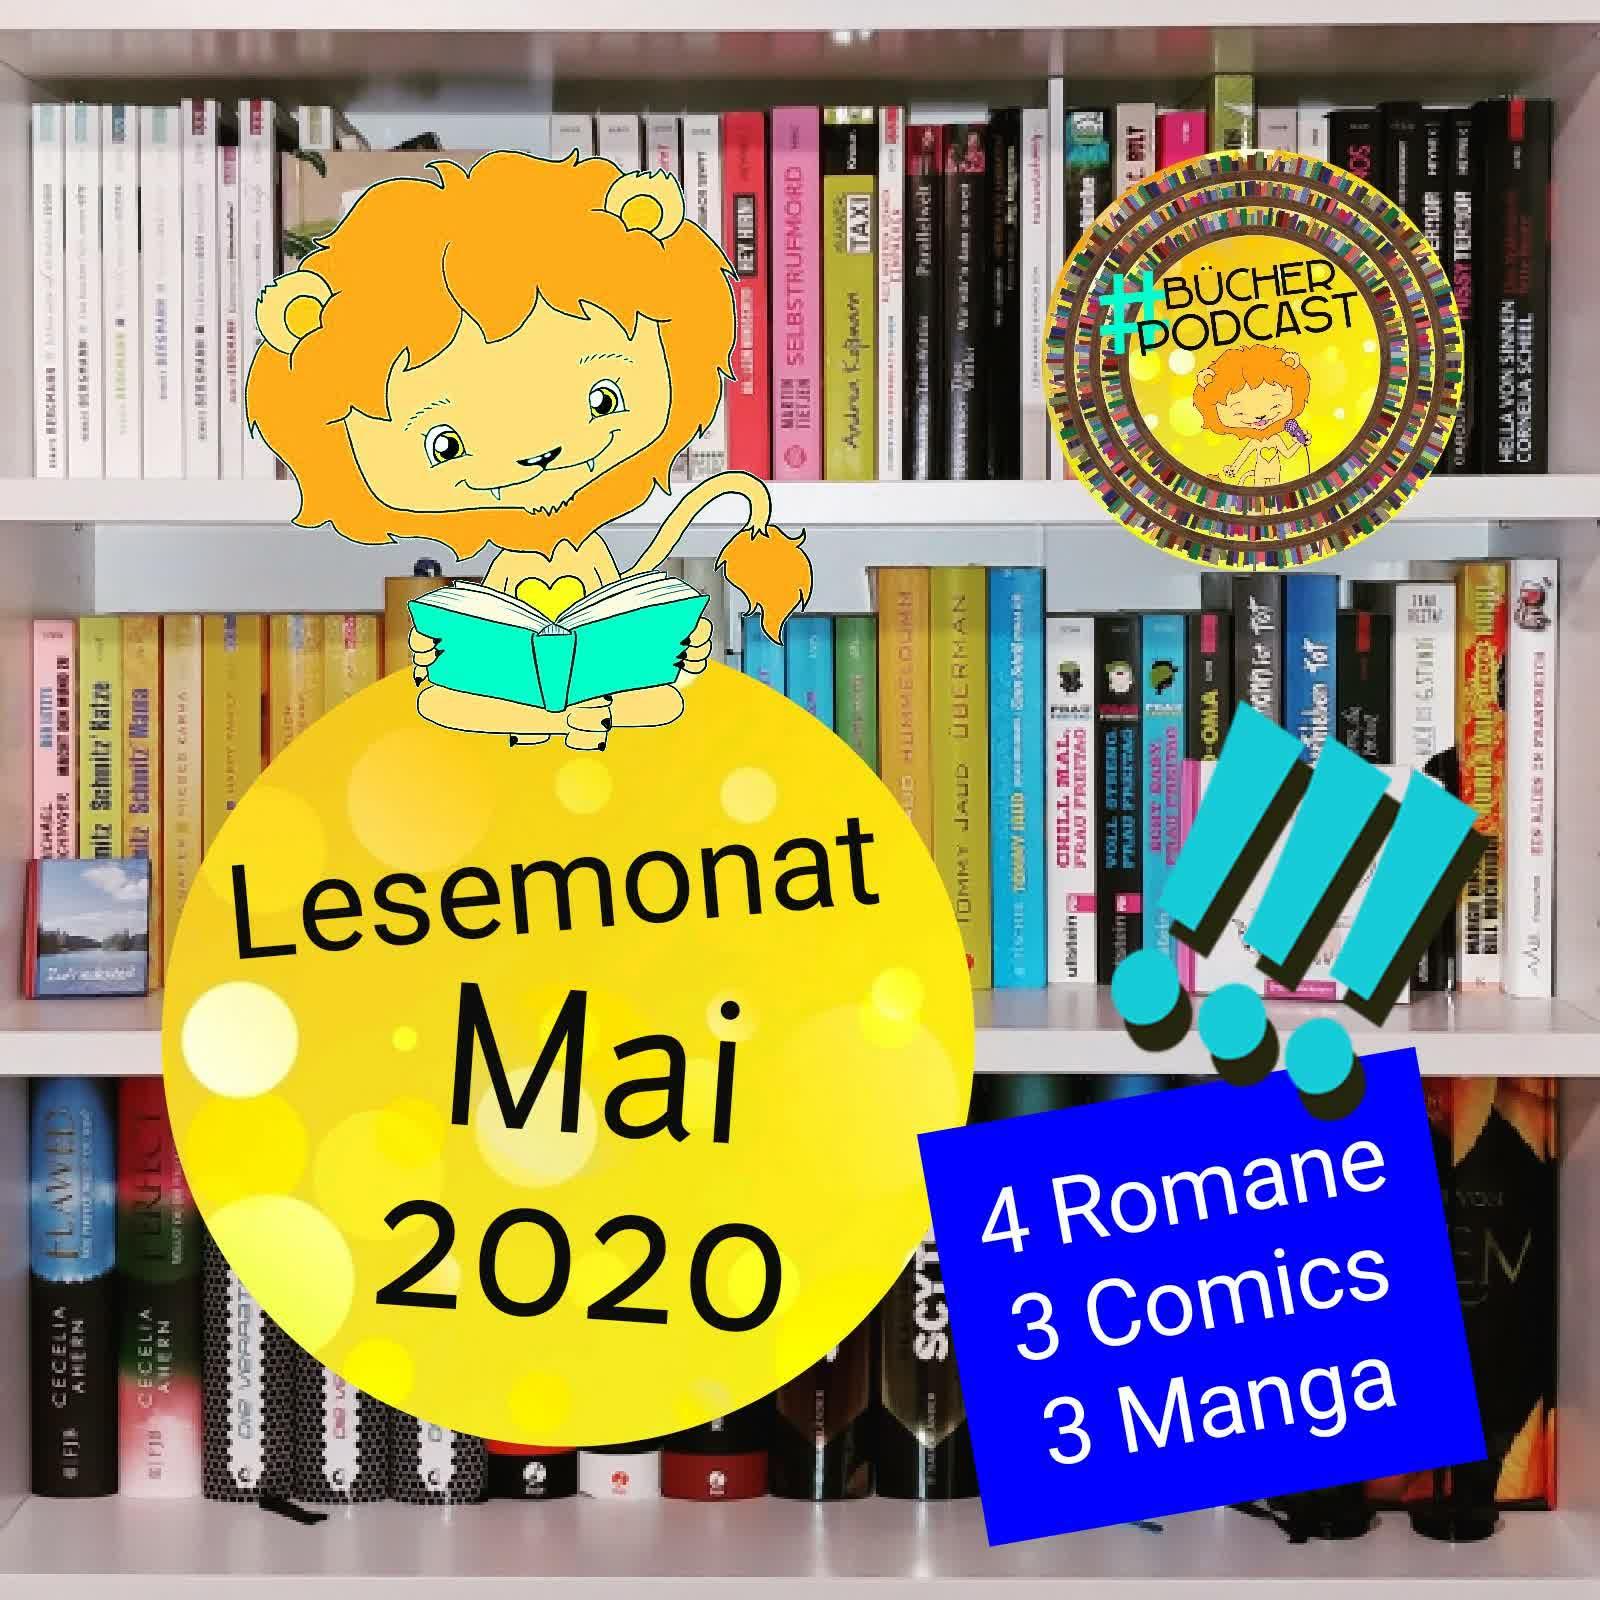 Lesemonat Mai 2020